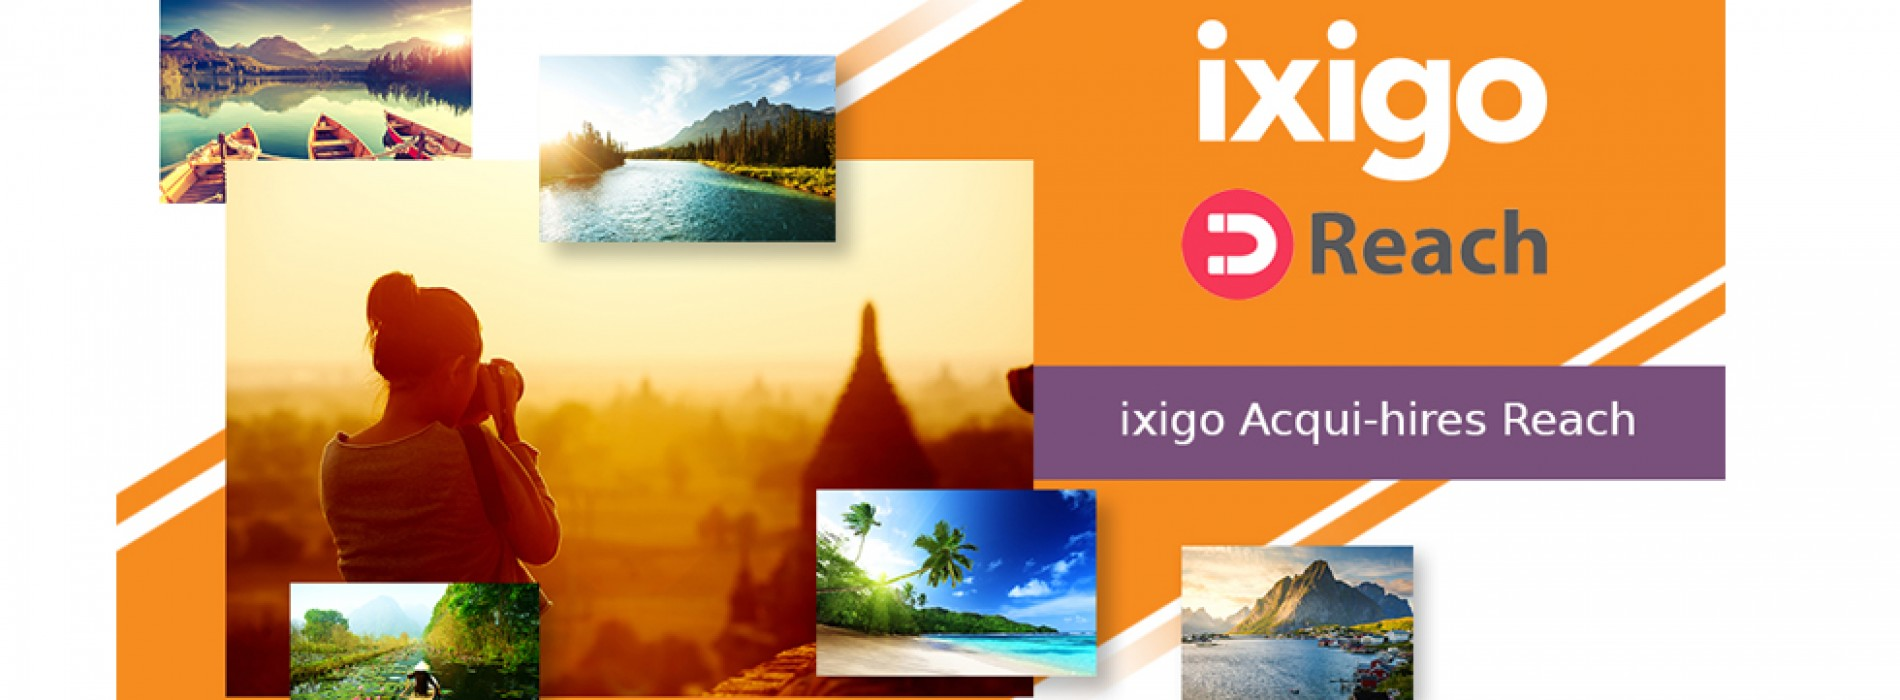 ixigo Acqui-hires Reach a Content Sharing Technology Startup